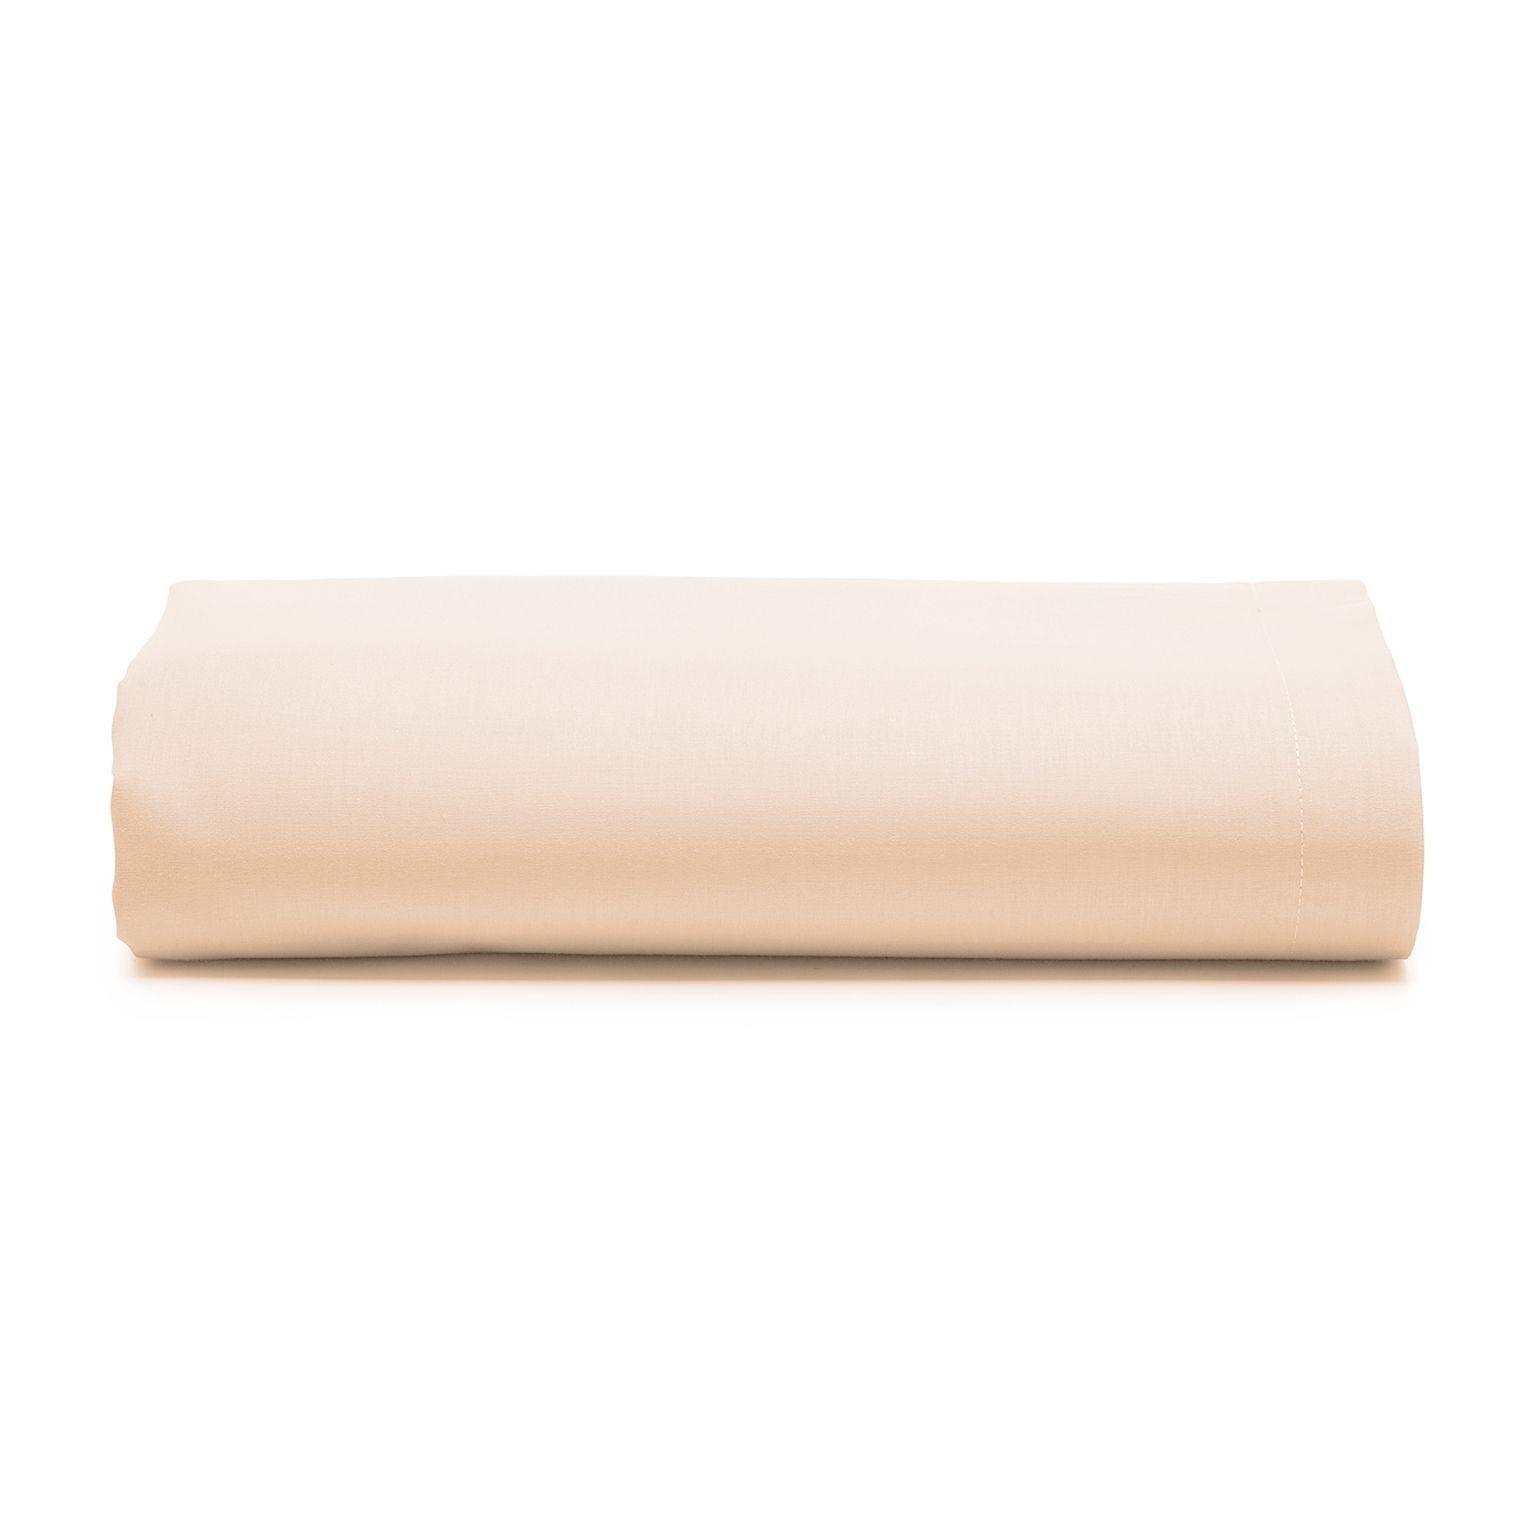 Lencol Casal Santista Royal sem Elastico 100 algodao 200x225 cm - Bege